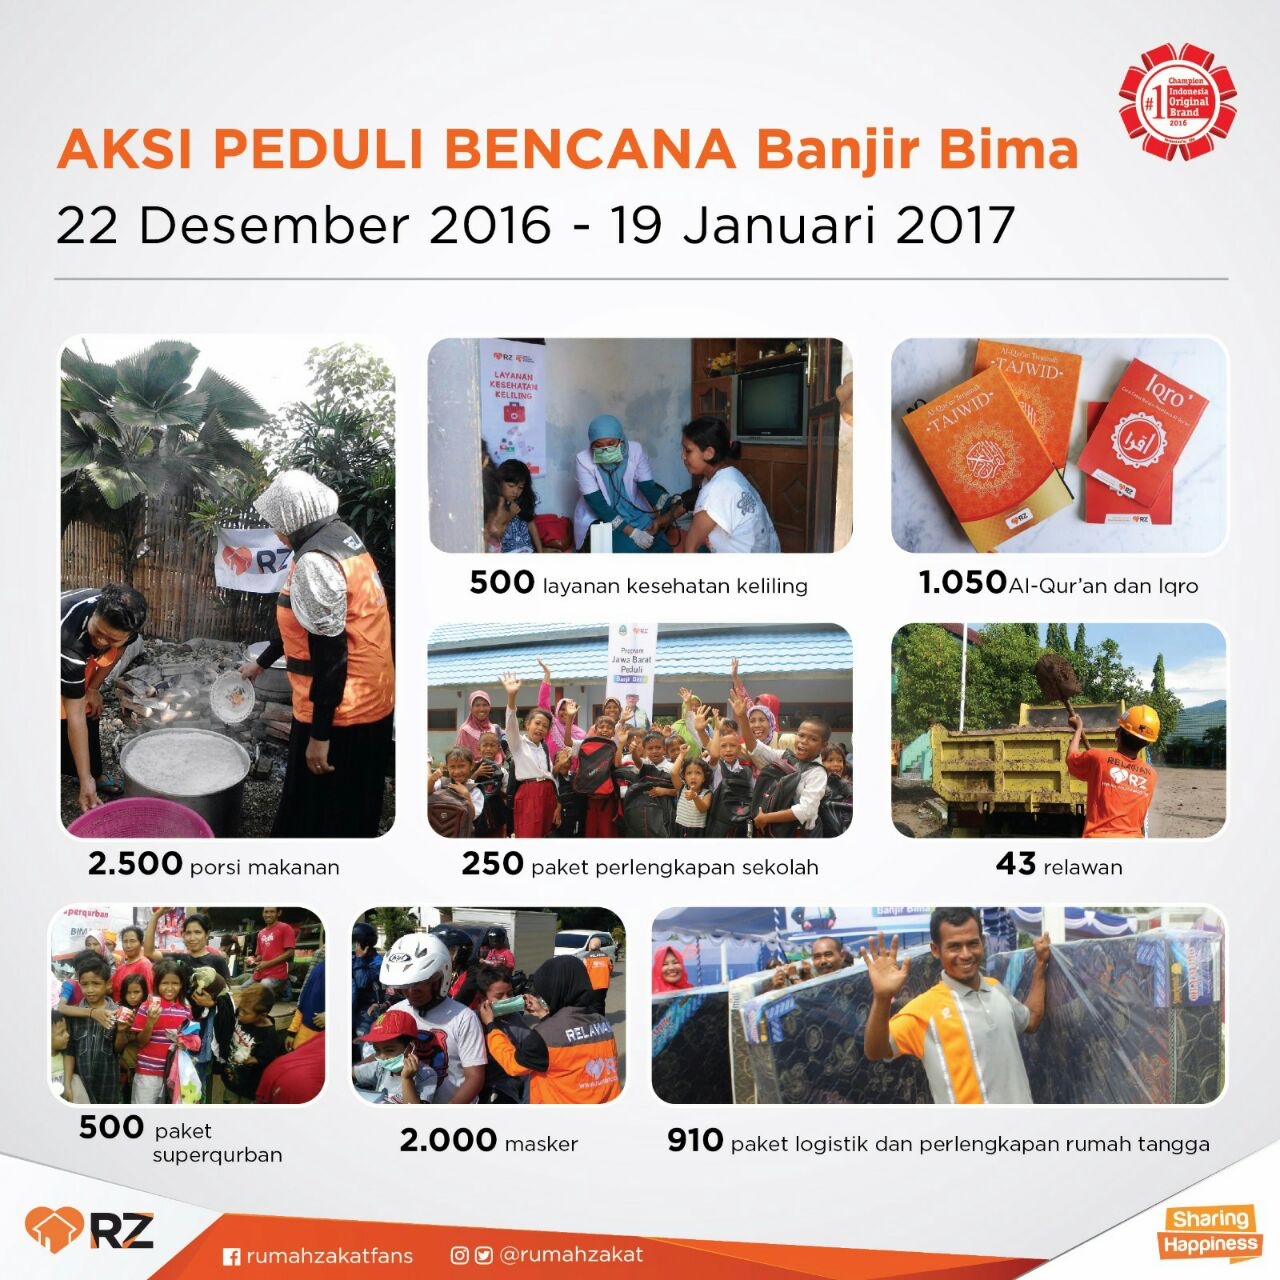 Bantu Recovery Bima, Relawan RZ Fokus Bantu Proses Paska Banjir